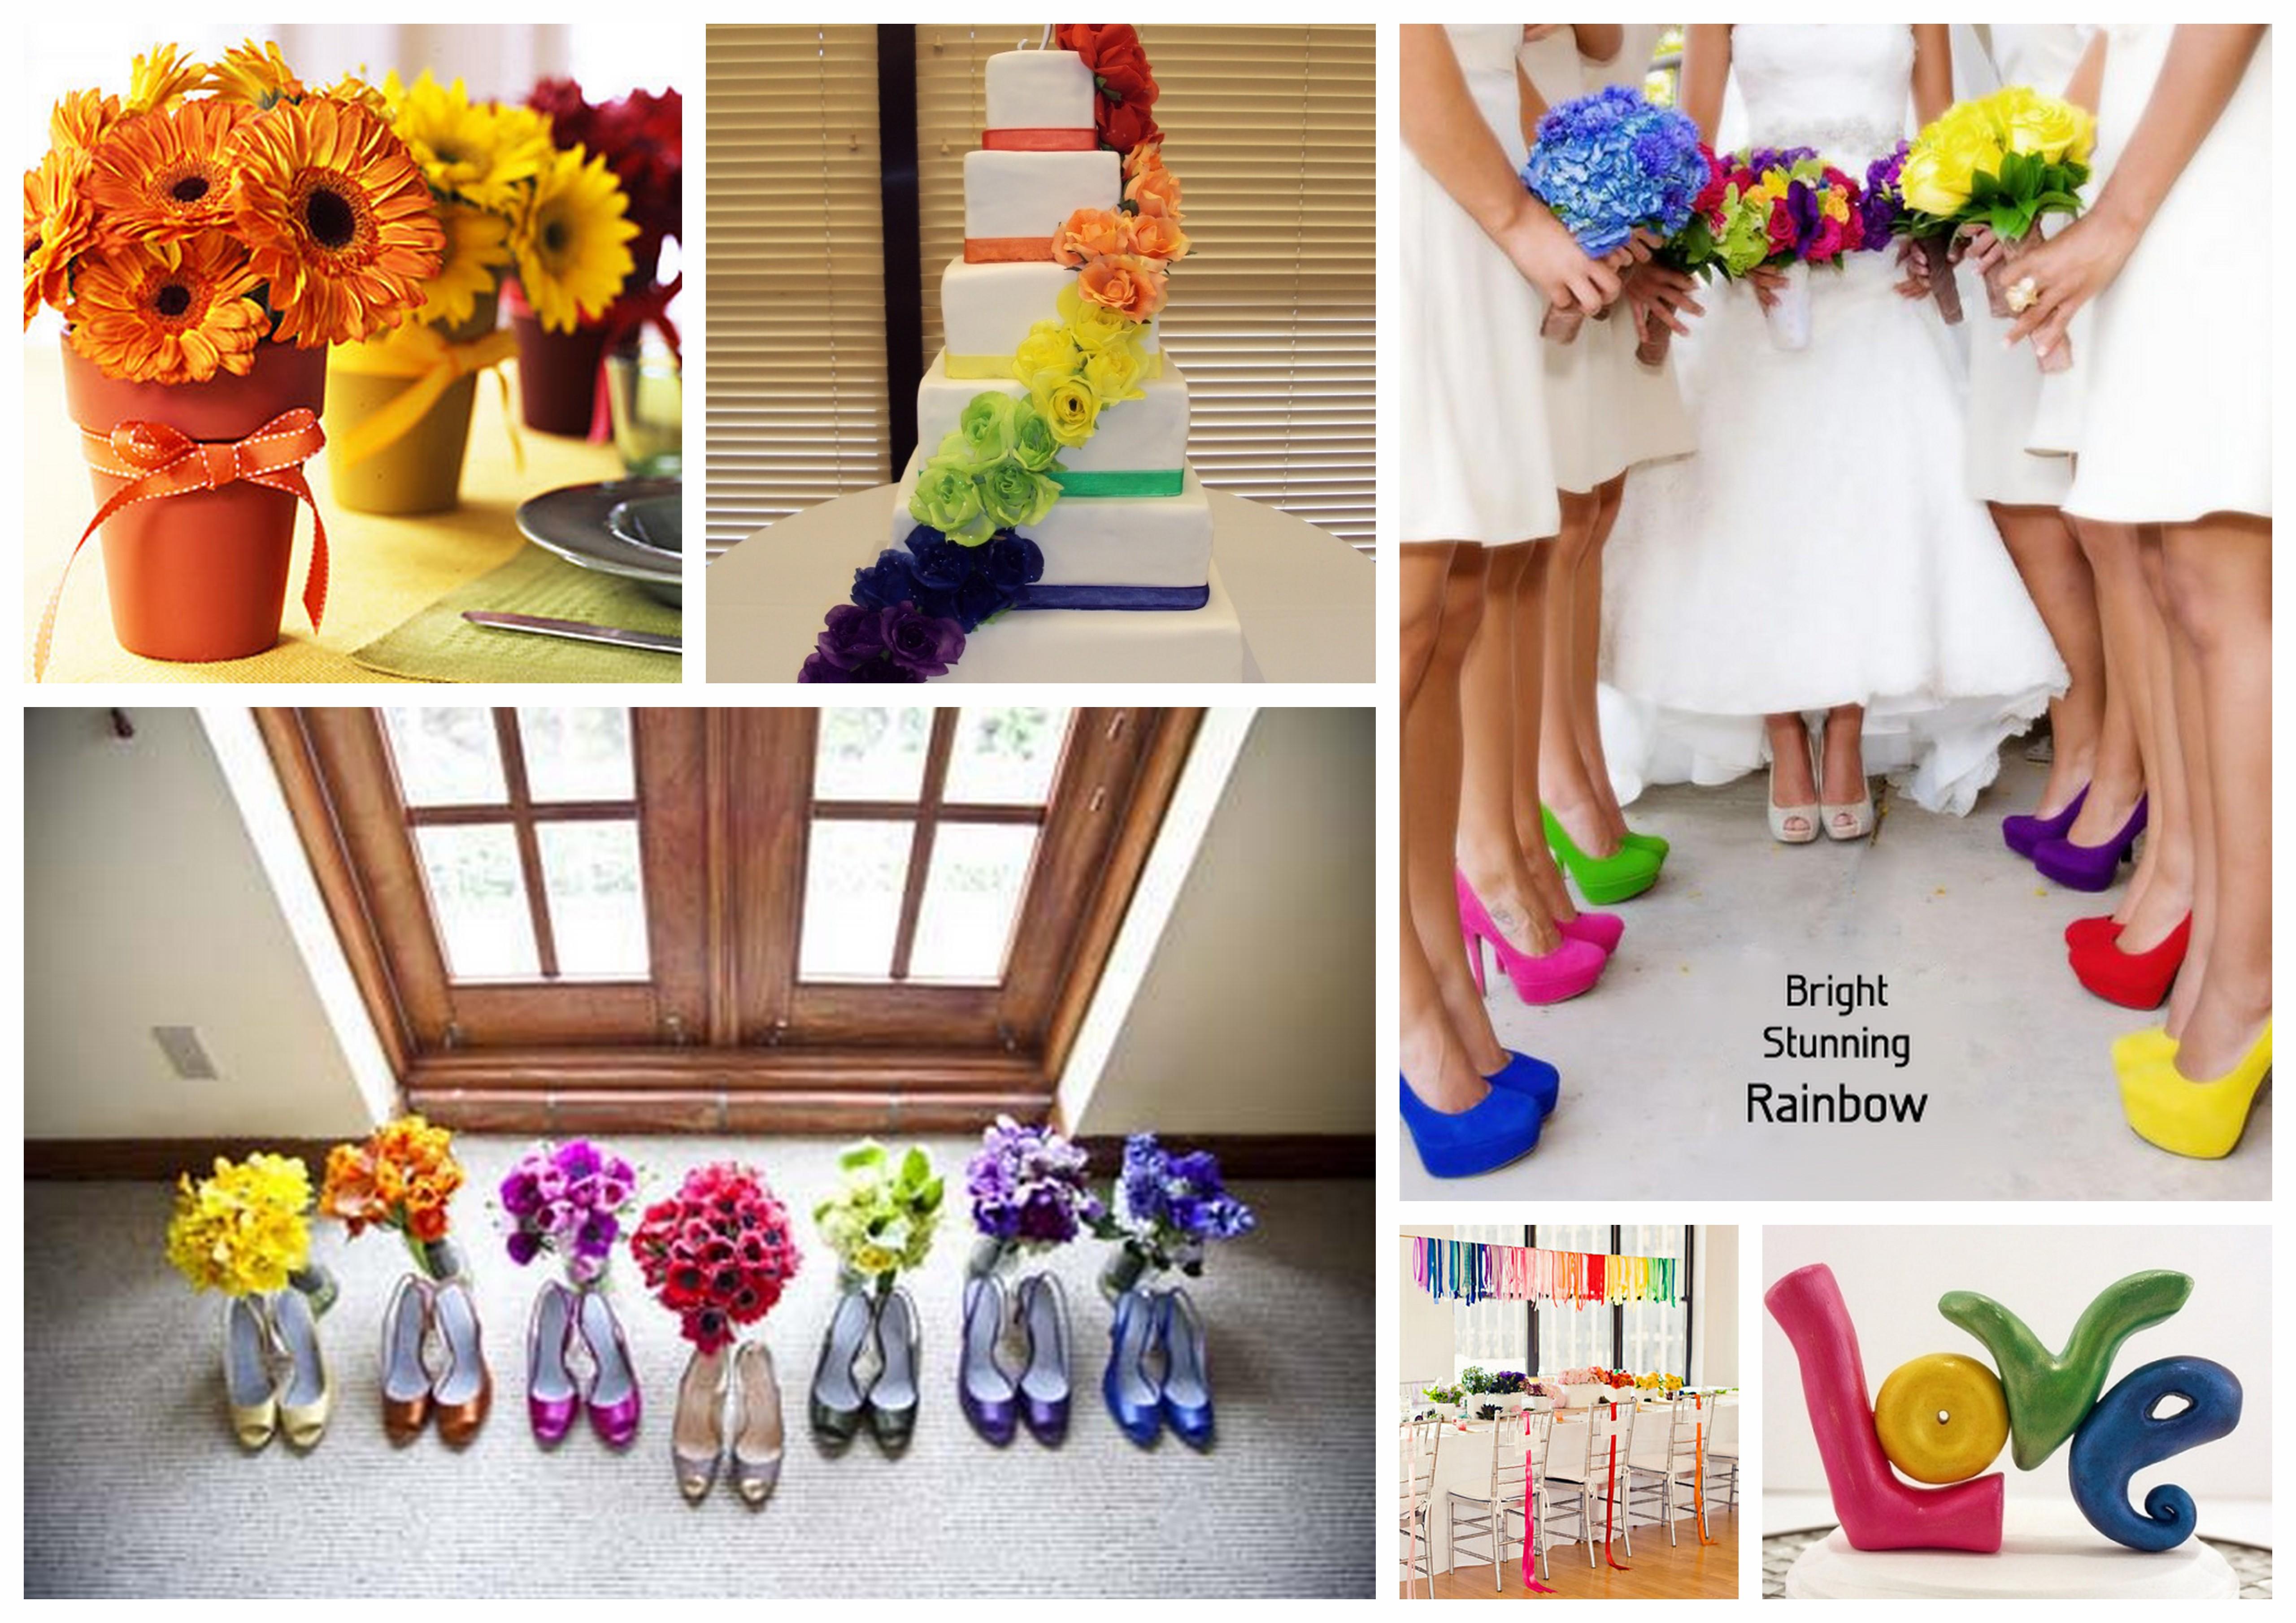 Cool Wedding Themes Ideas Whimsical Circus Wedding Theme Ideas With